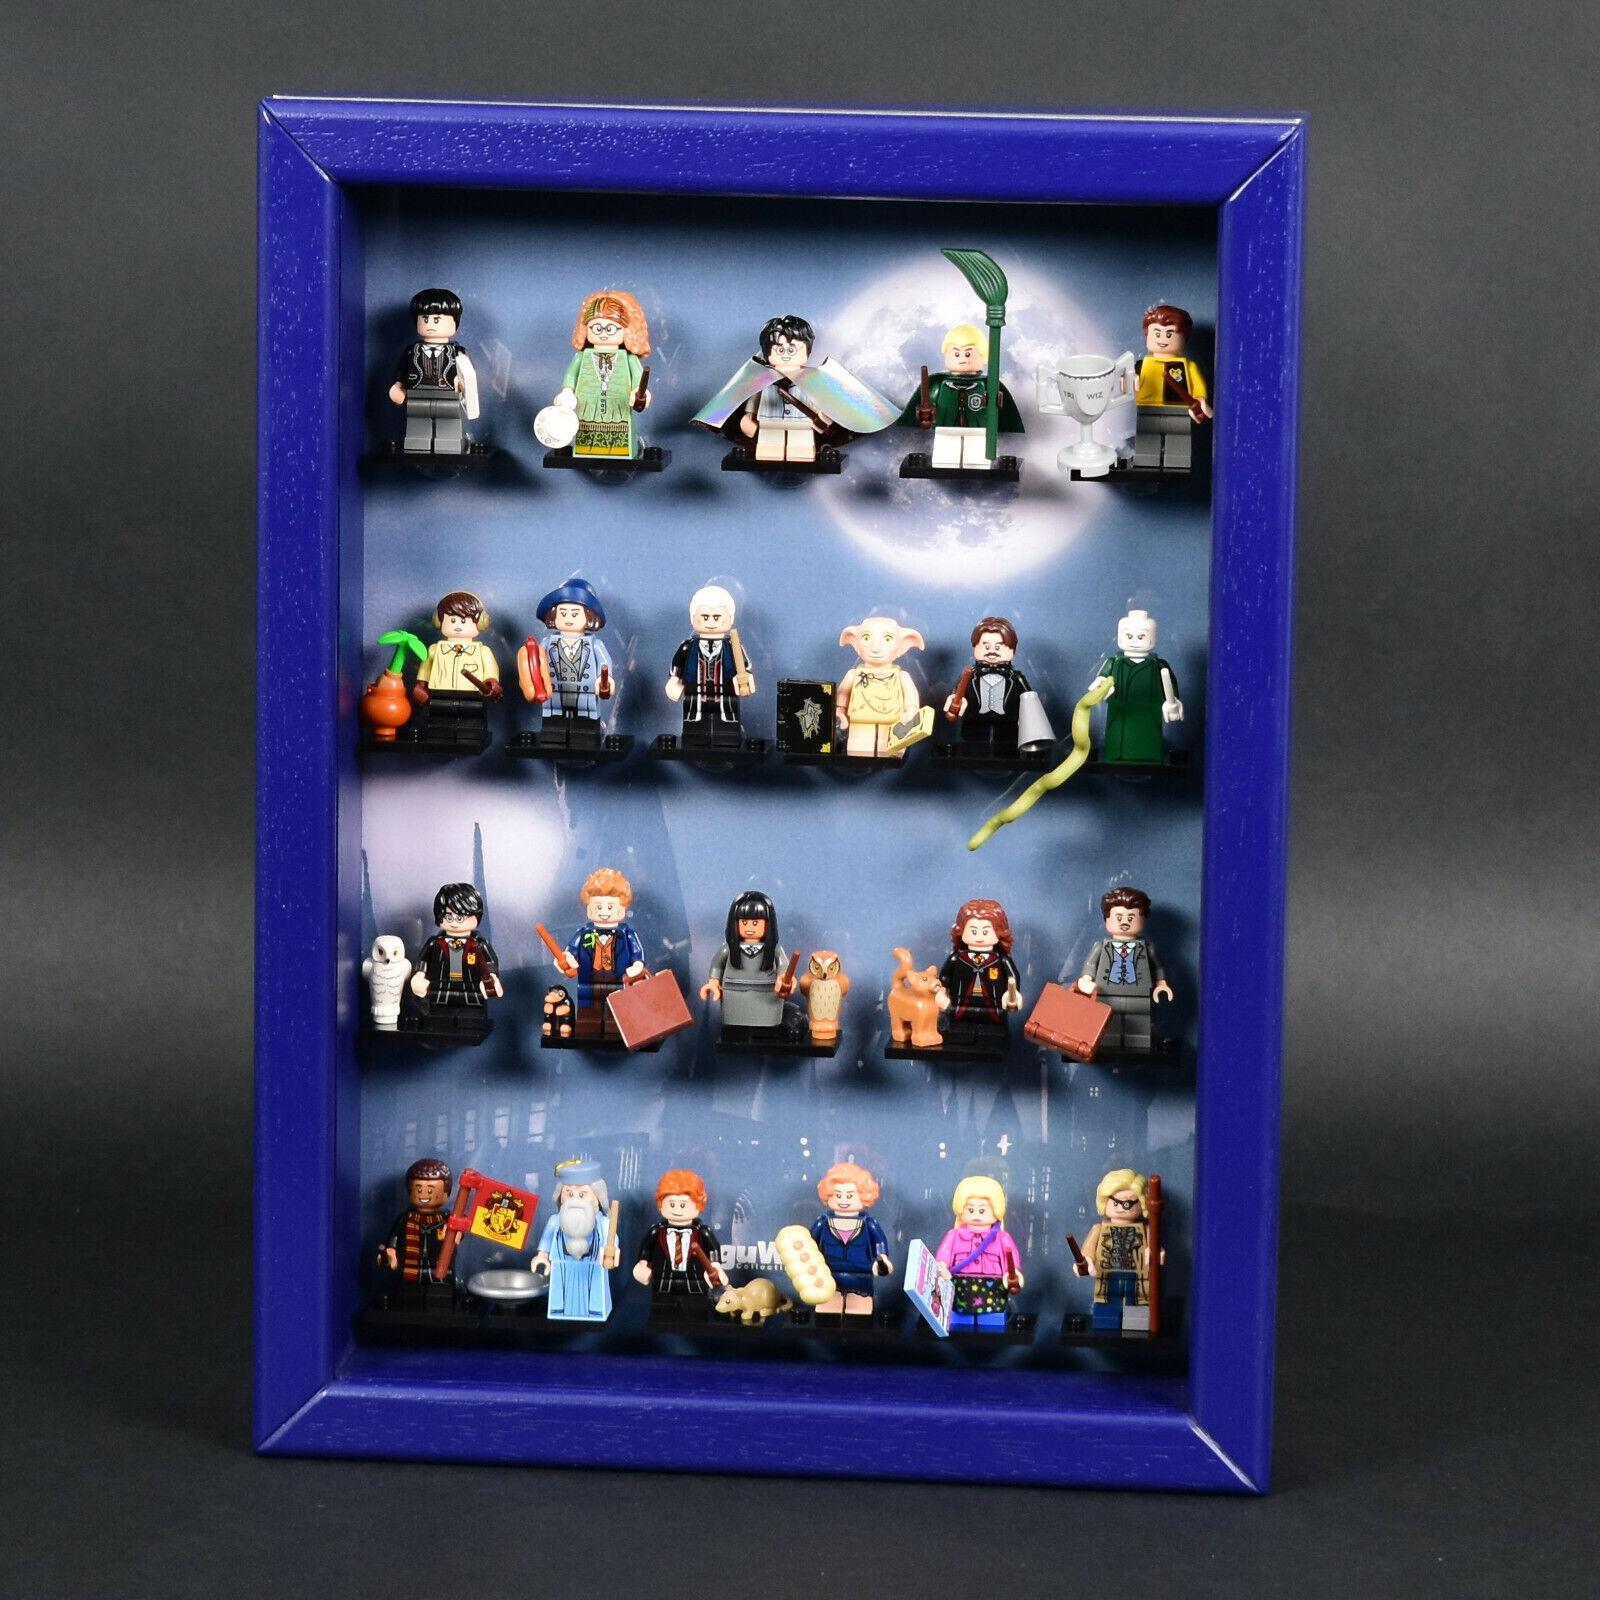 FiguCase® Click System Vitrine für LEGO® Serie Harry Potter (71022) Blau Blau